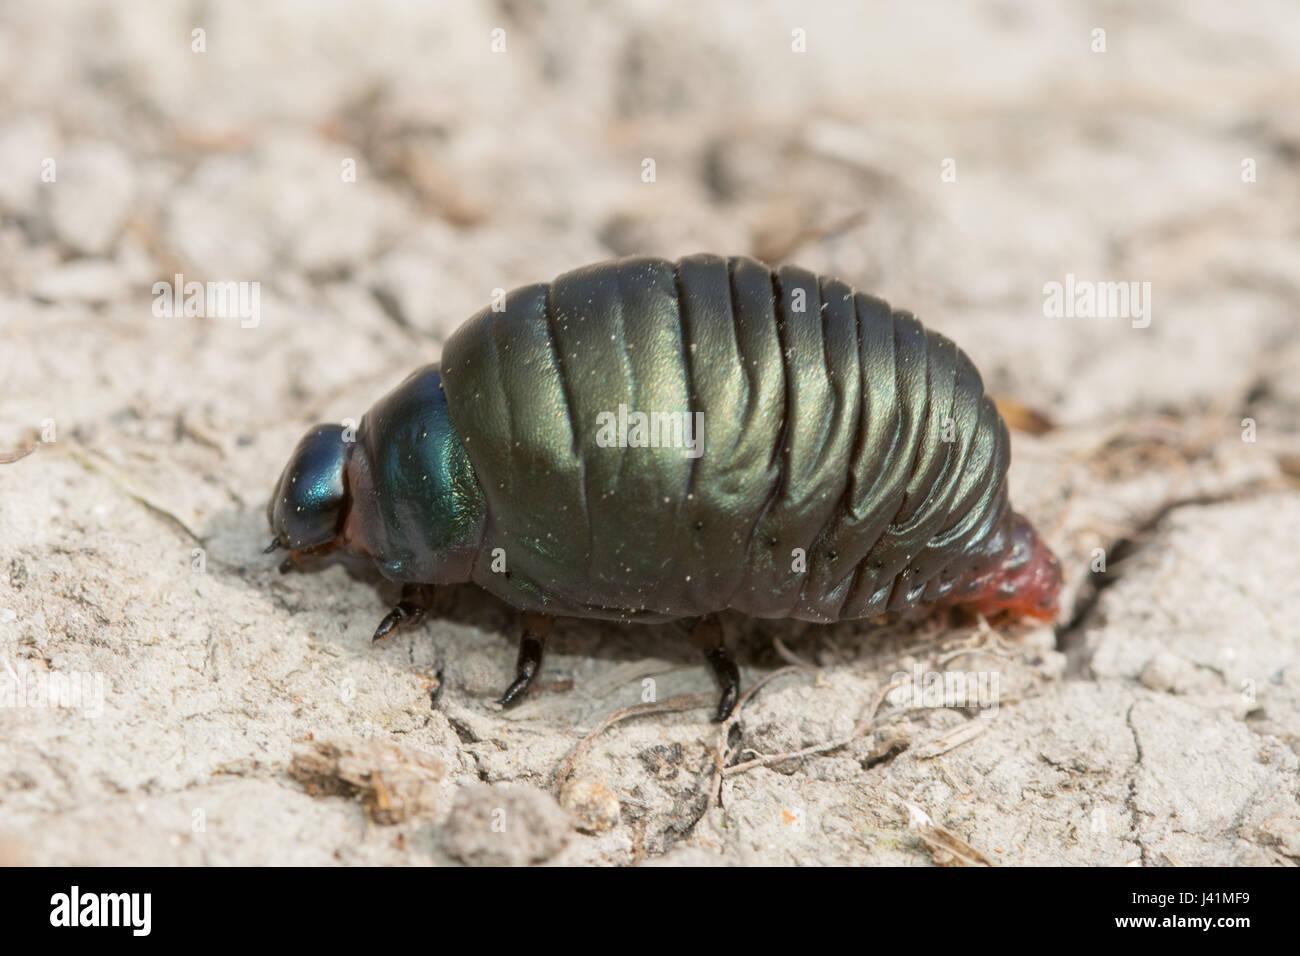 close-up-of-bloody-nosed-beetle-timarcha-tenebricosa-larva-J41MF9.jpg